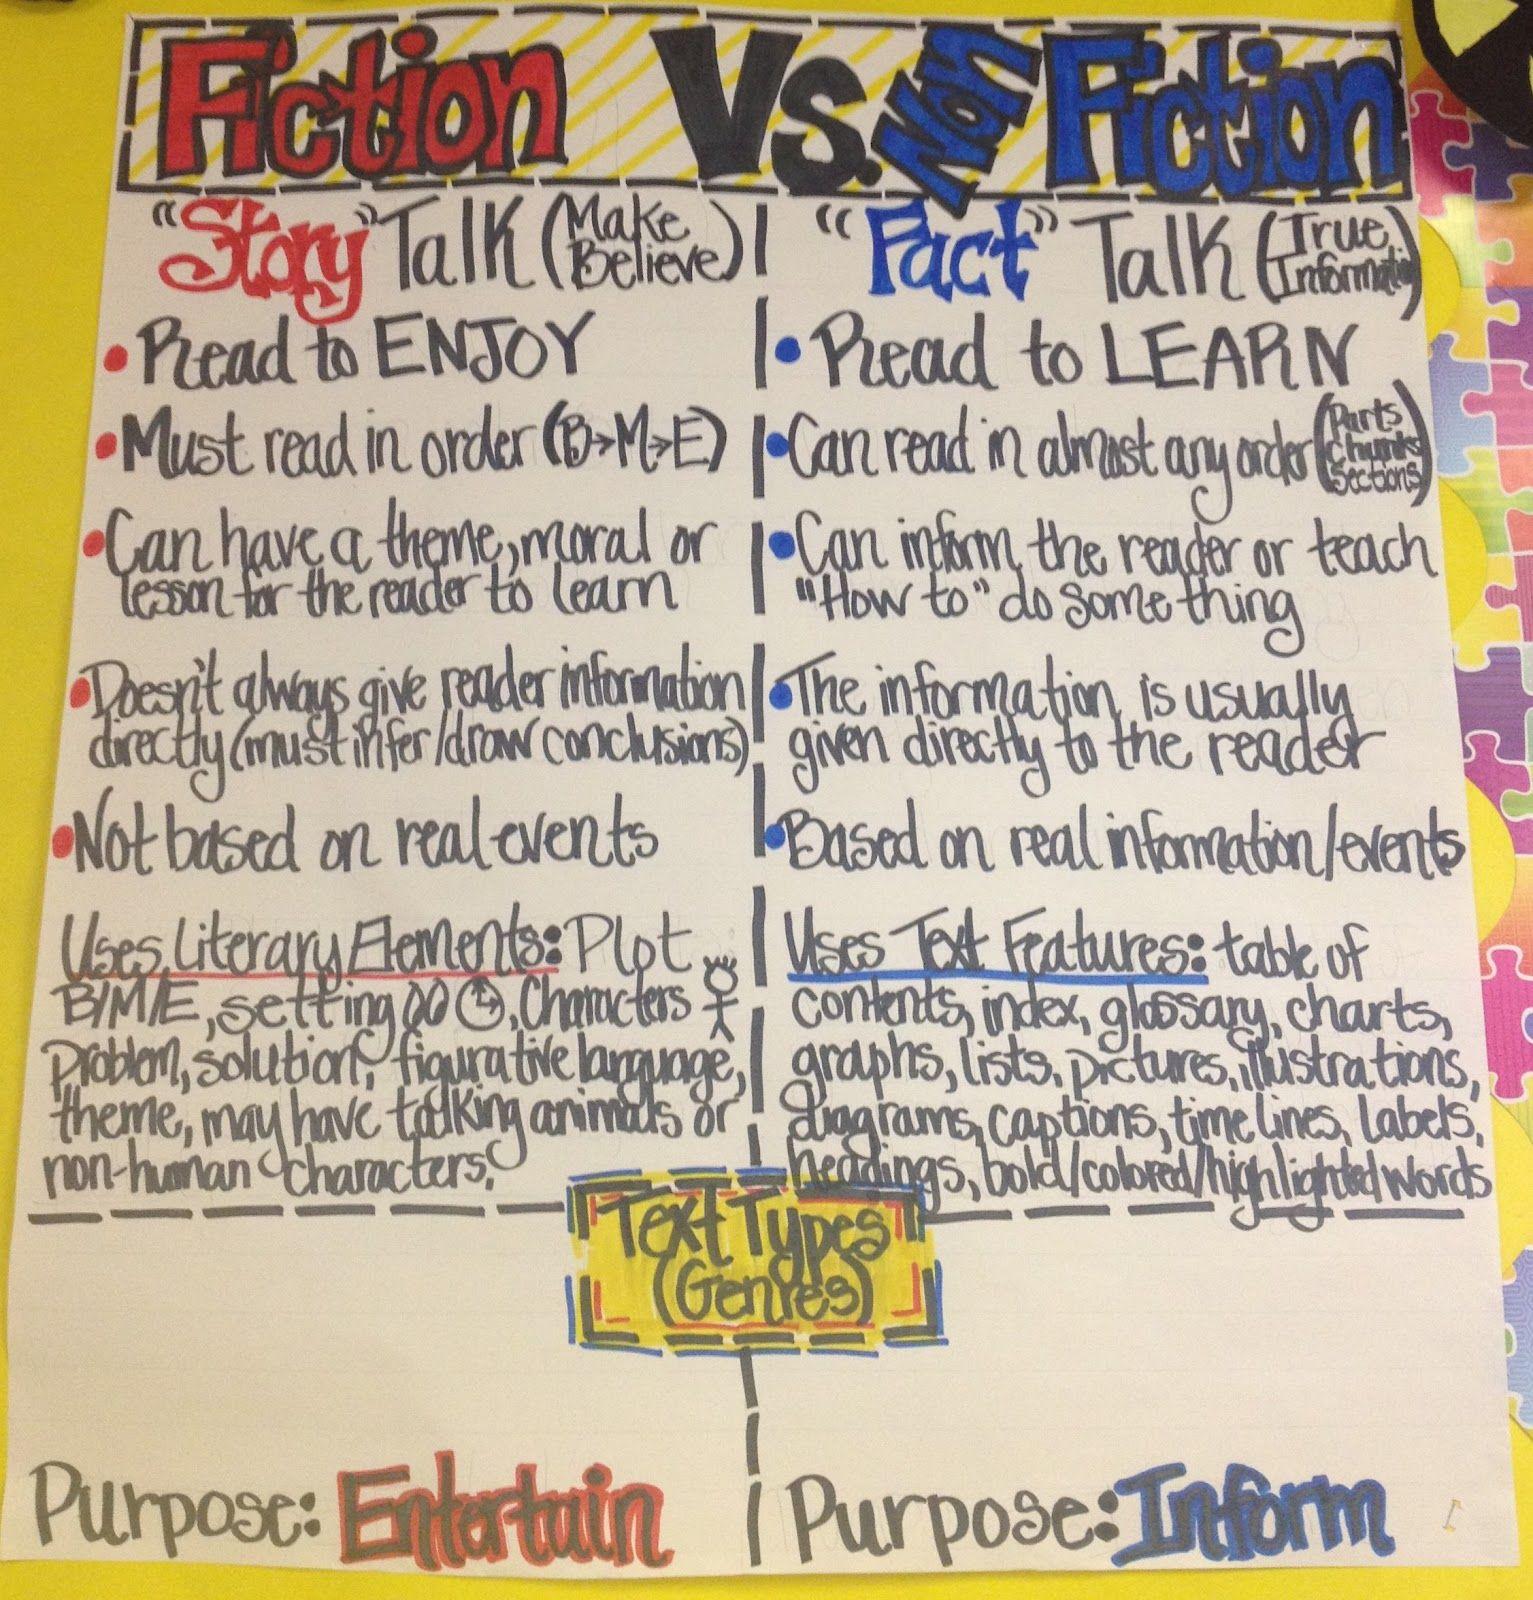 fiction vs nonfiction venn diagram 1998 honda crv wiring repair guides diagrams working 4 the classroom